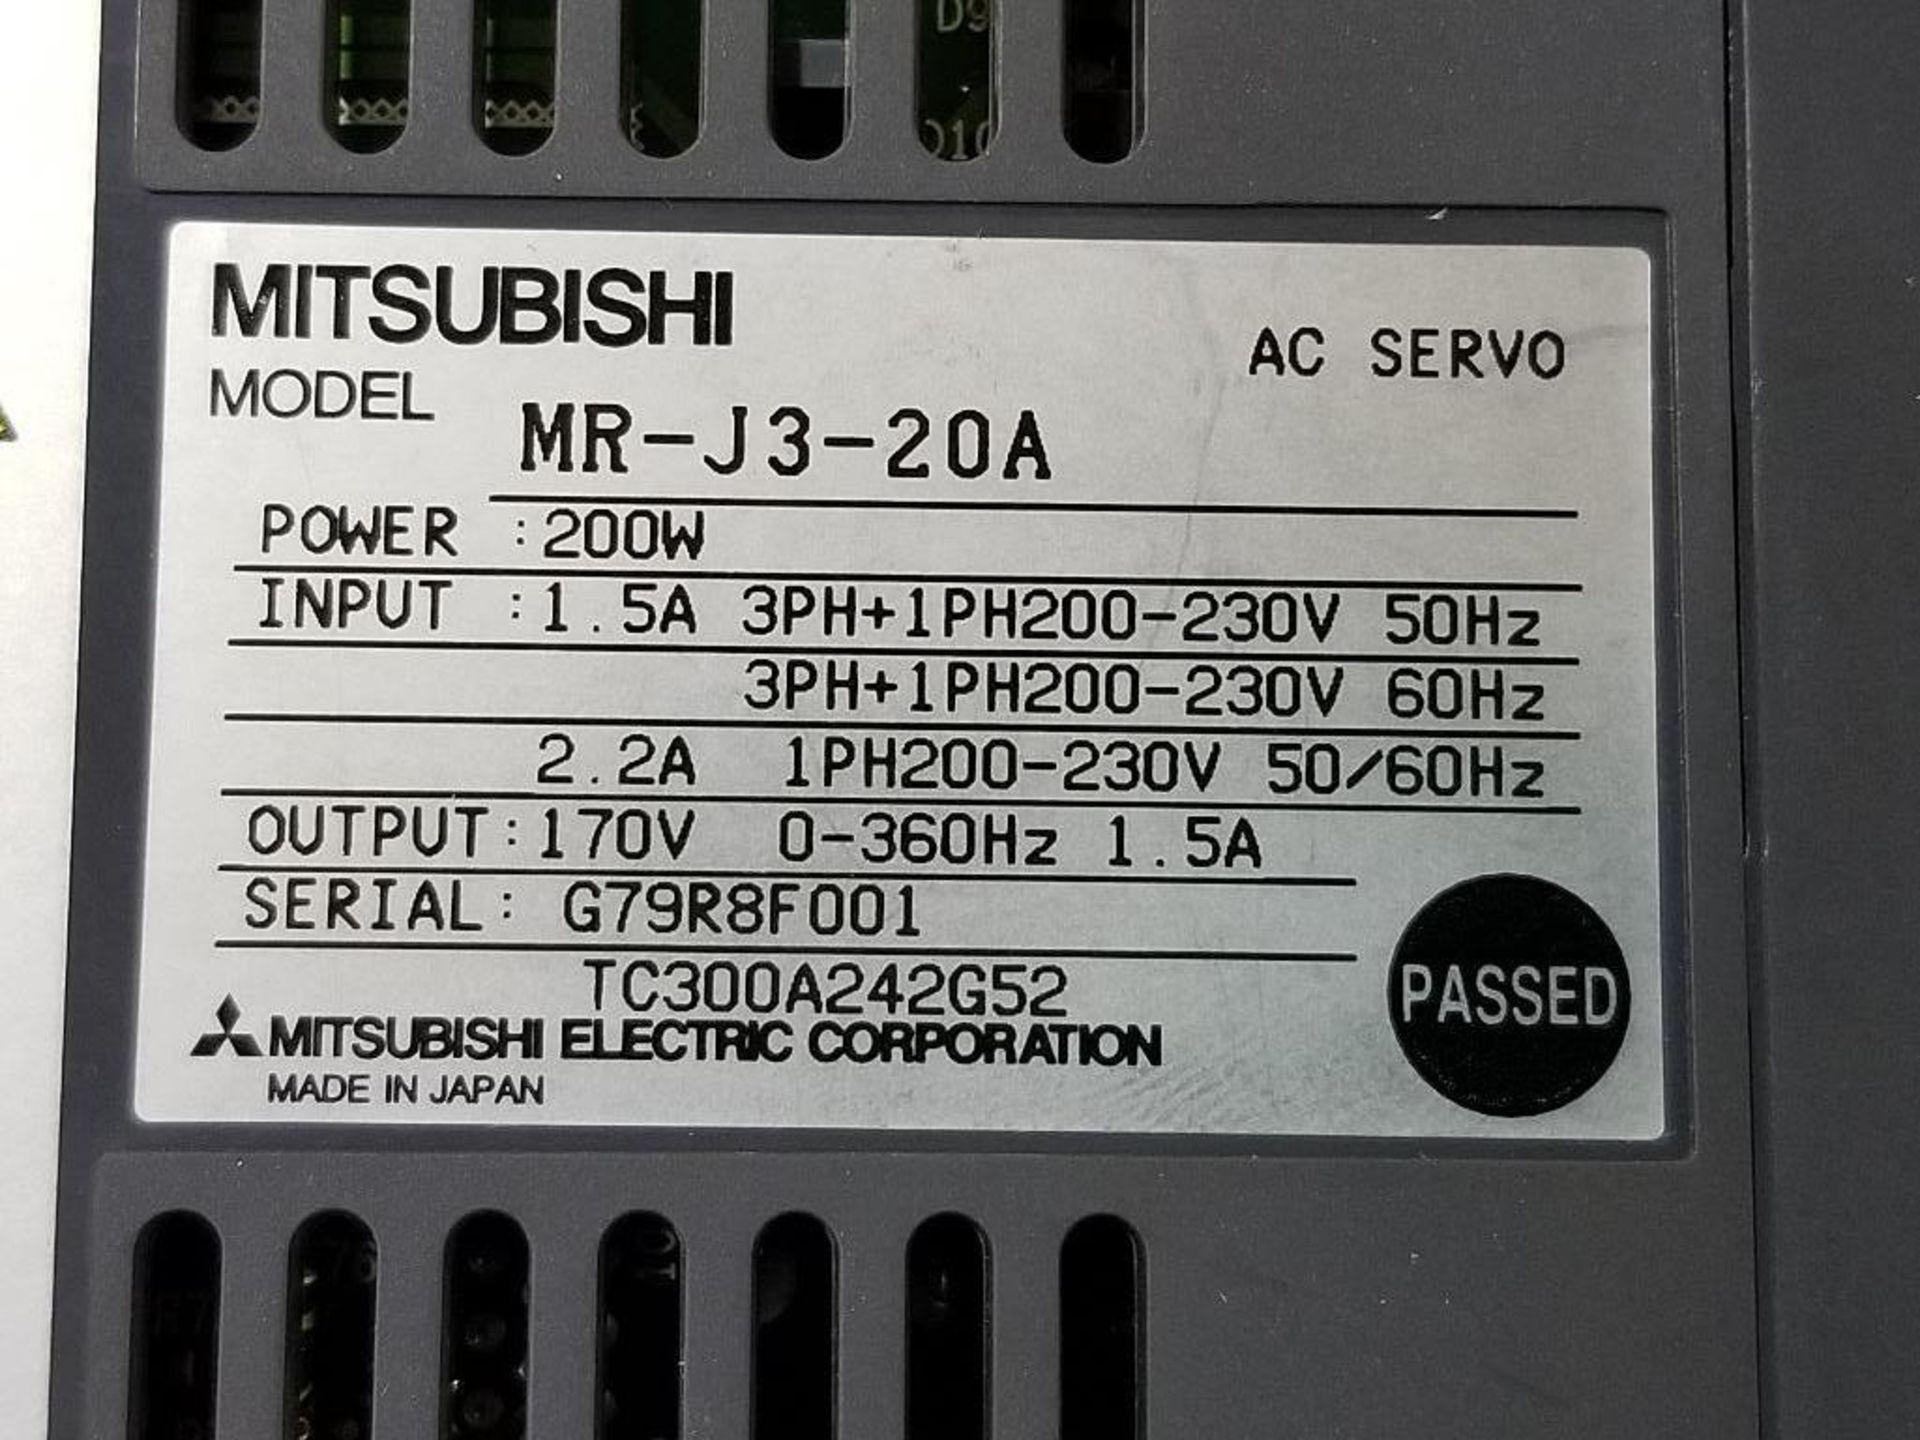 Mitsubishi MR-J3-20A AC Servo drive. - Image 5 of 5